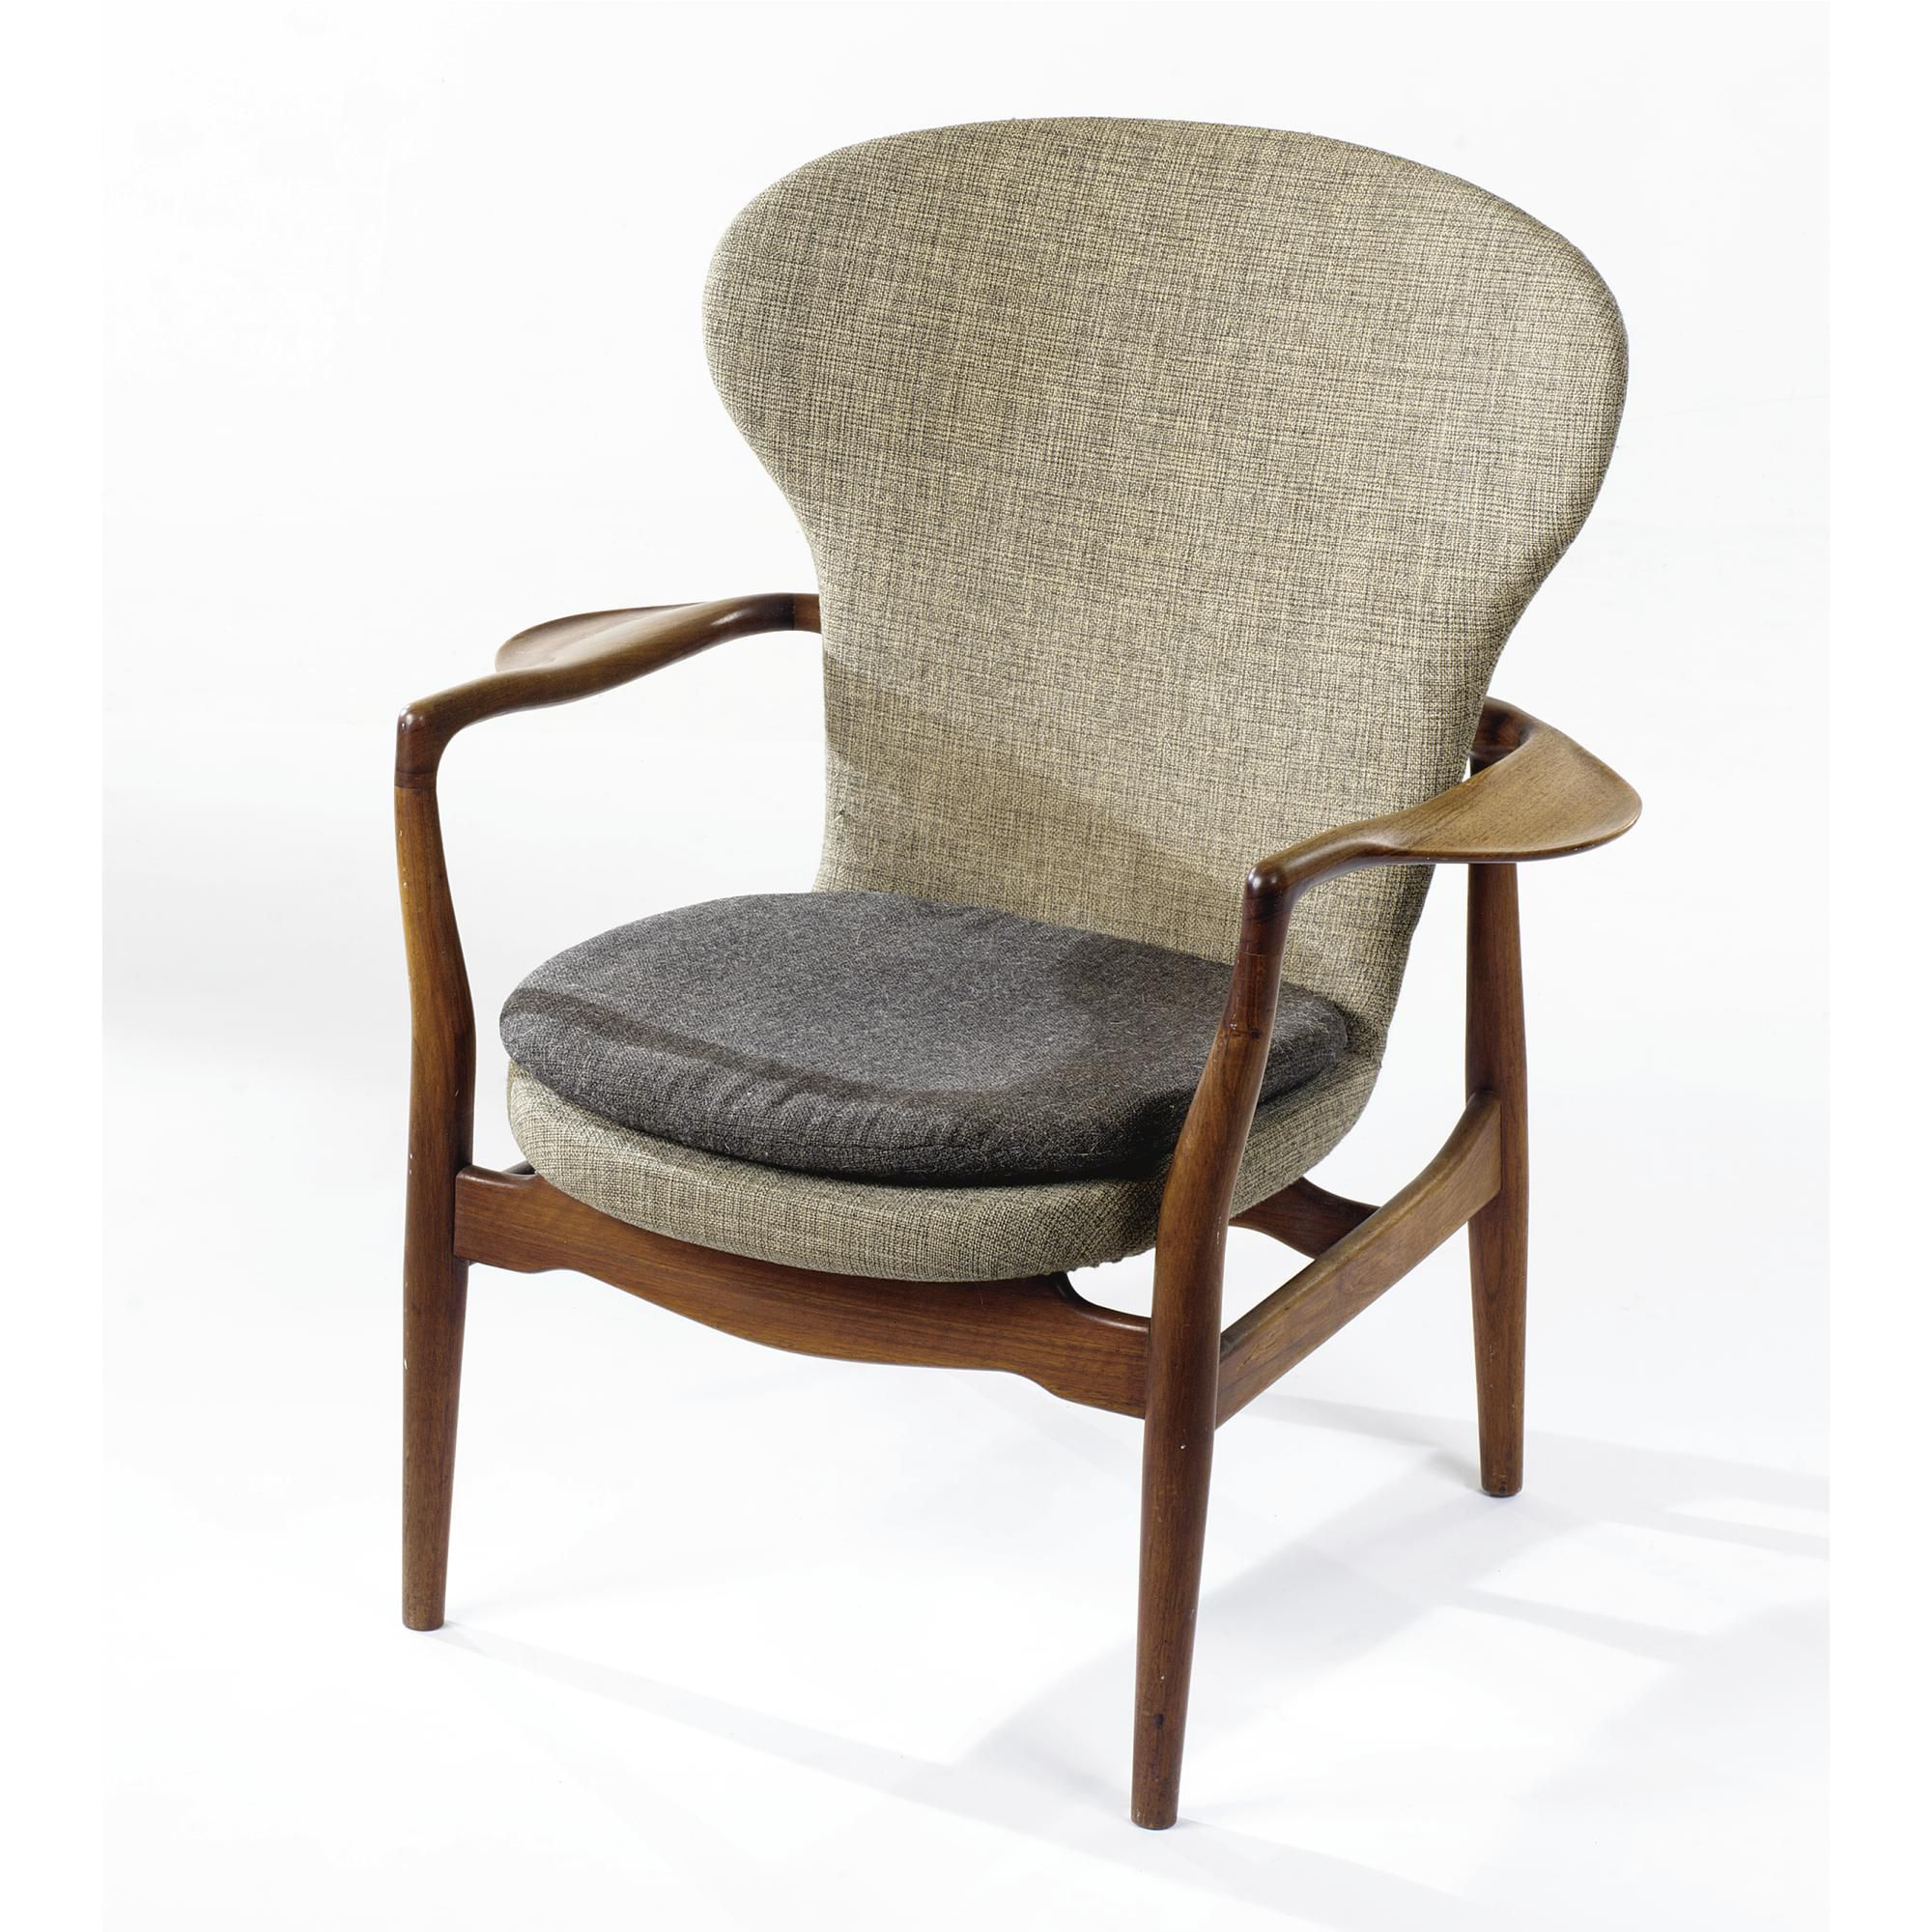 Juhl Finn A Rare 20th Century Design Sotheby S N08454lot3nqfpen Scandinavian Furniture Design Furniture Design Modern Furniture